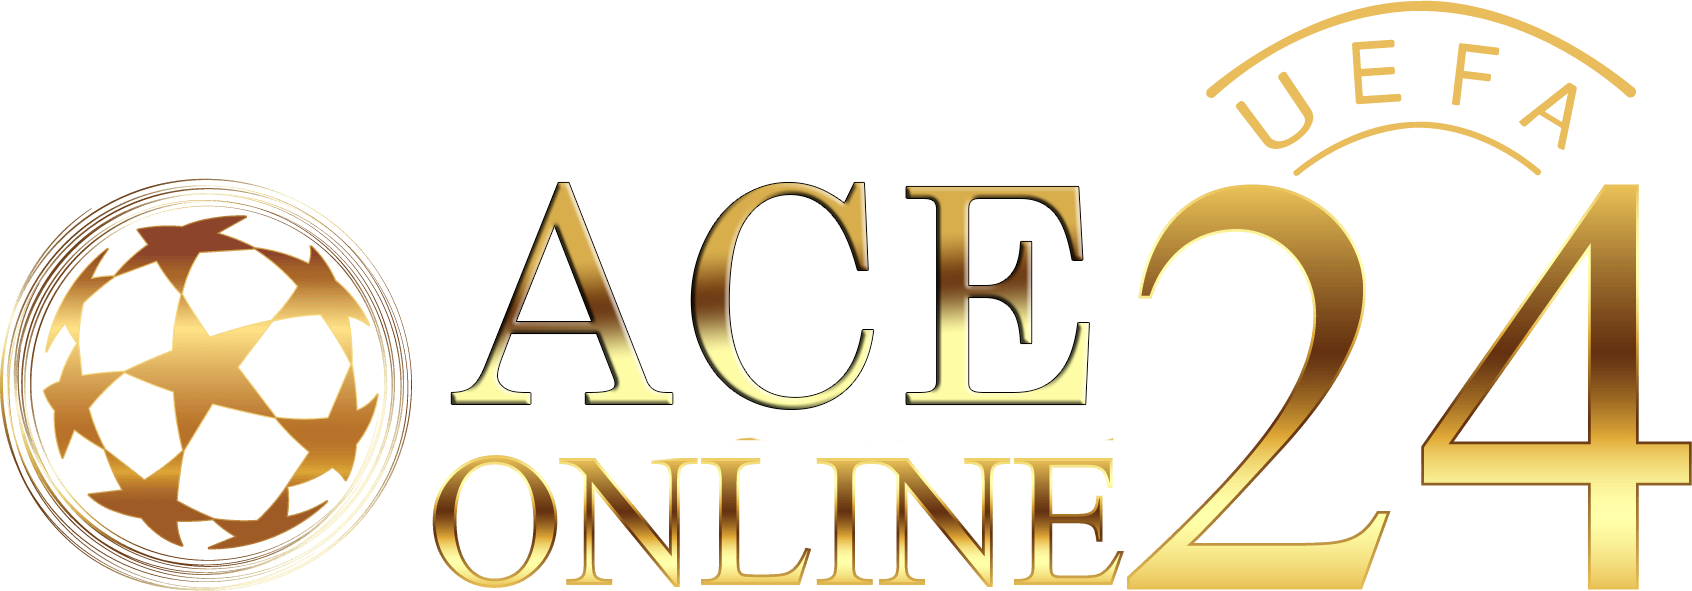 aceonline24.com